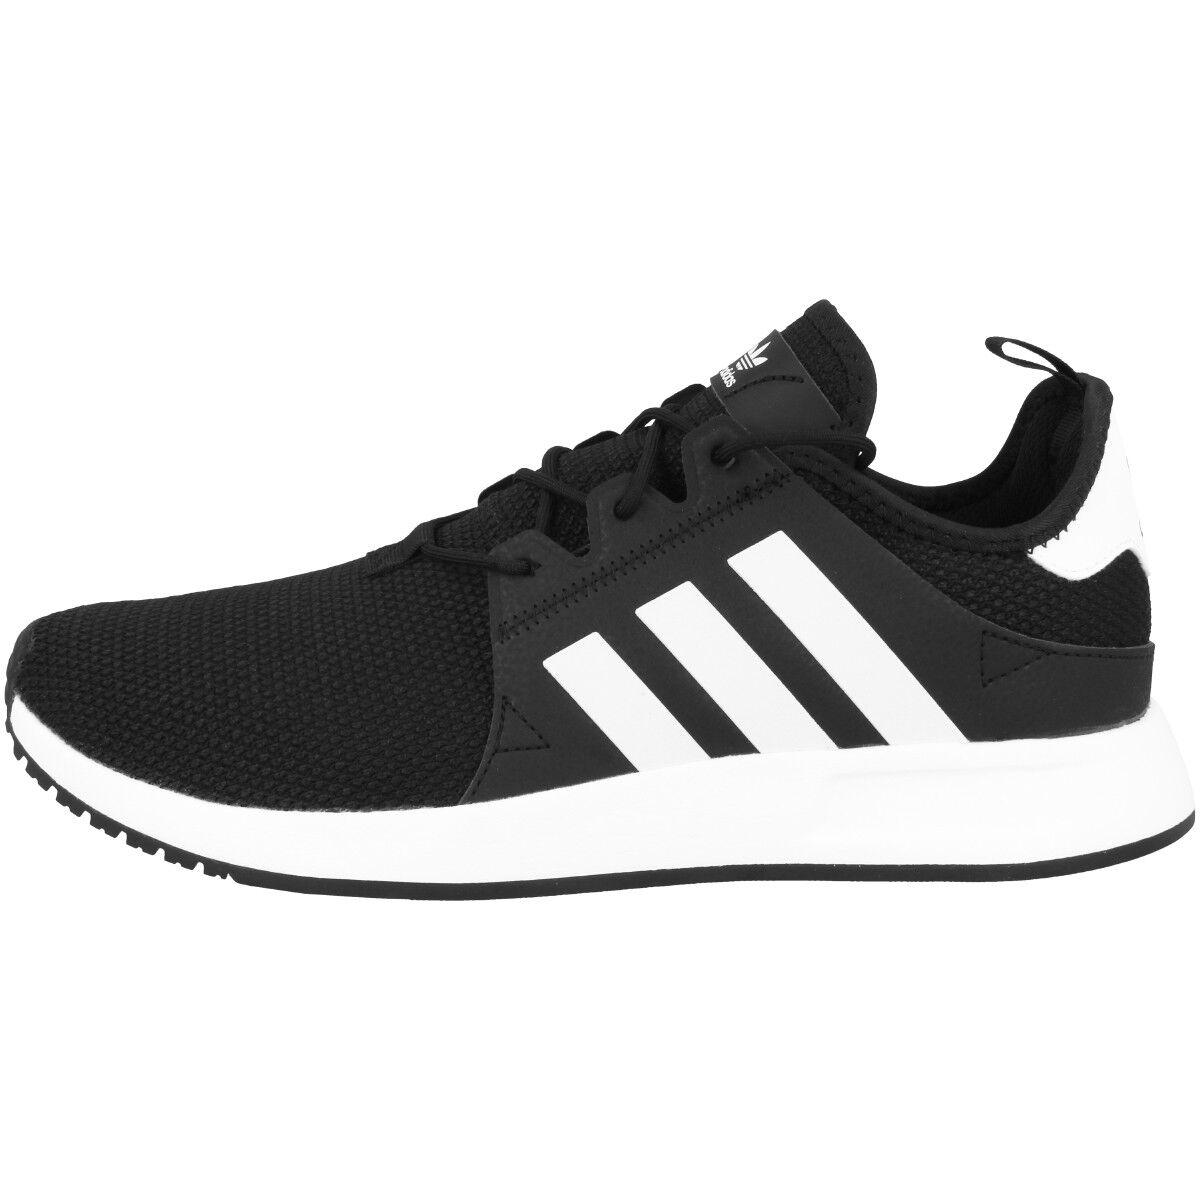 Adidas X_PLR Men Schuhe Herren Sport Sneaker Laufschuhe black white CQ2405